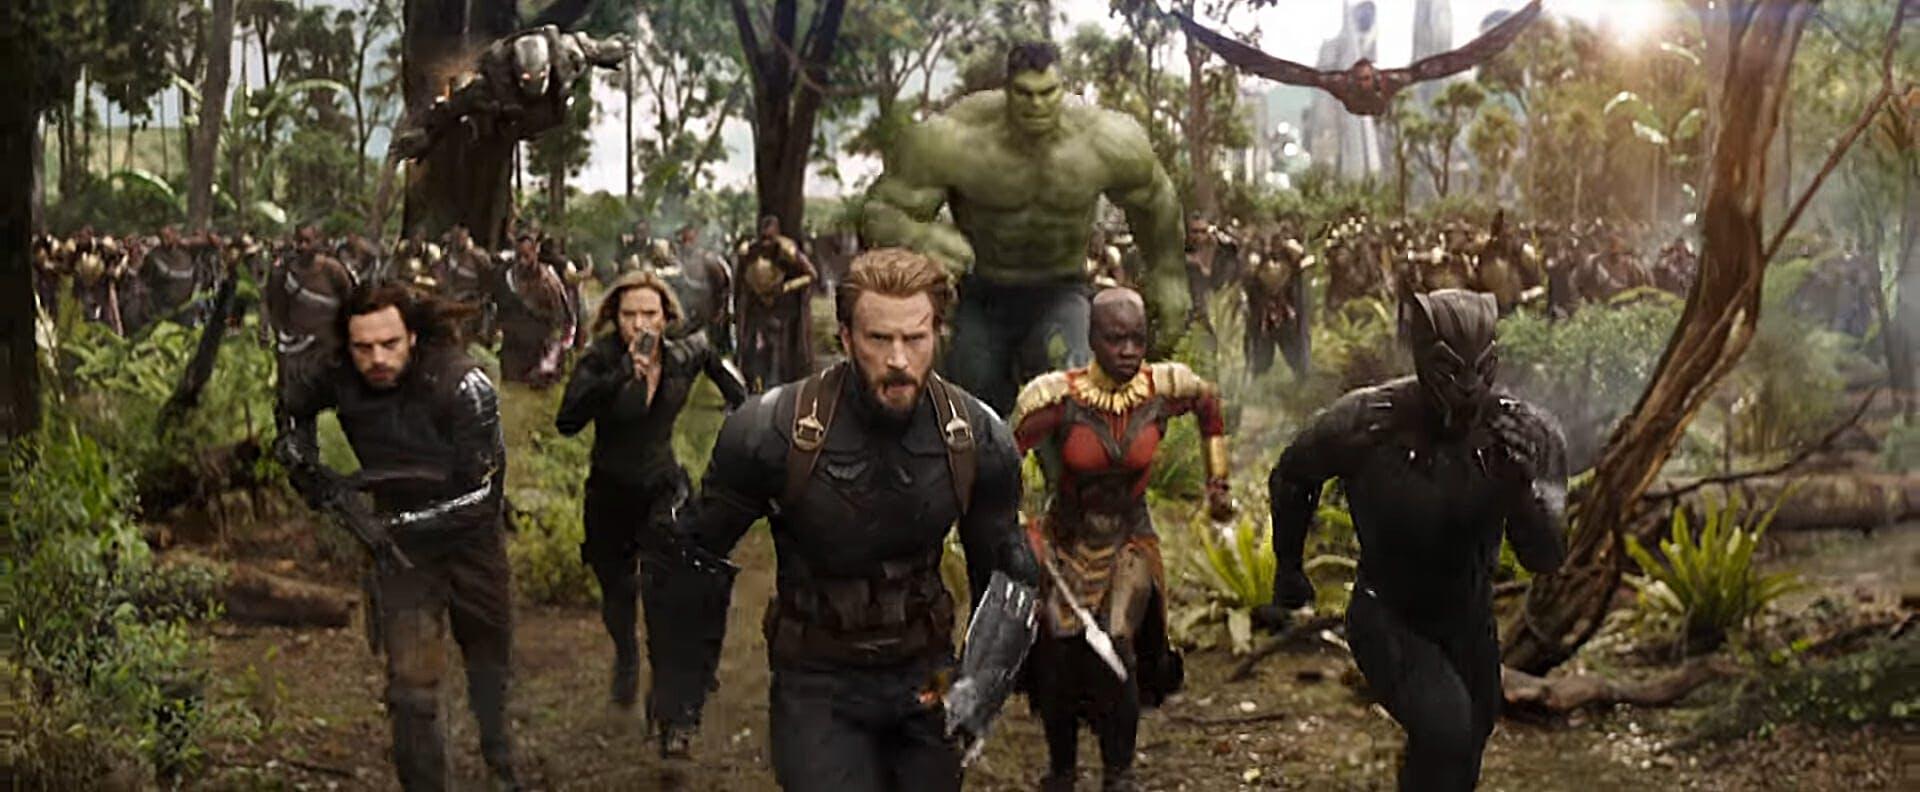 mcu phase 4 Infinity War jungle battle